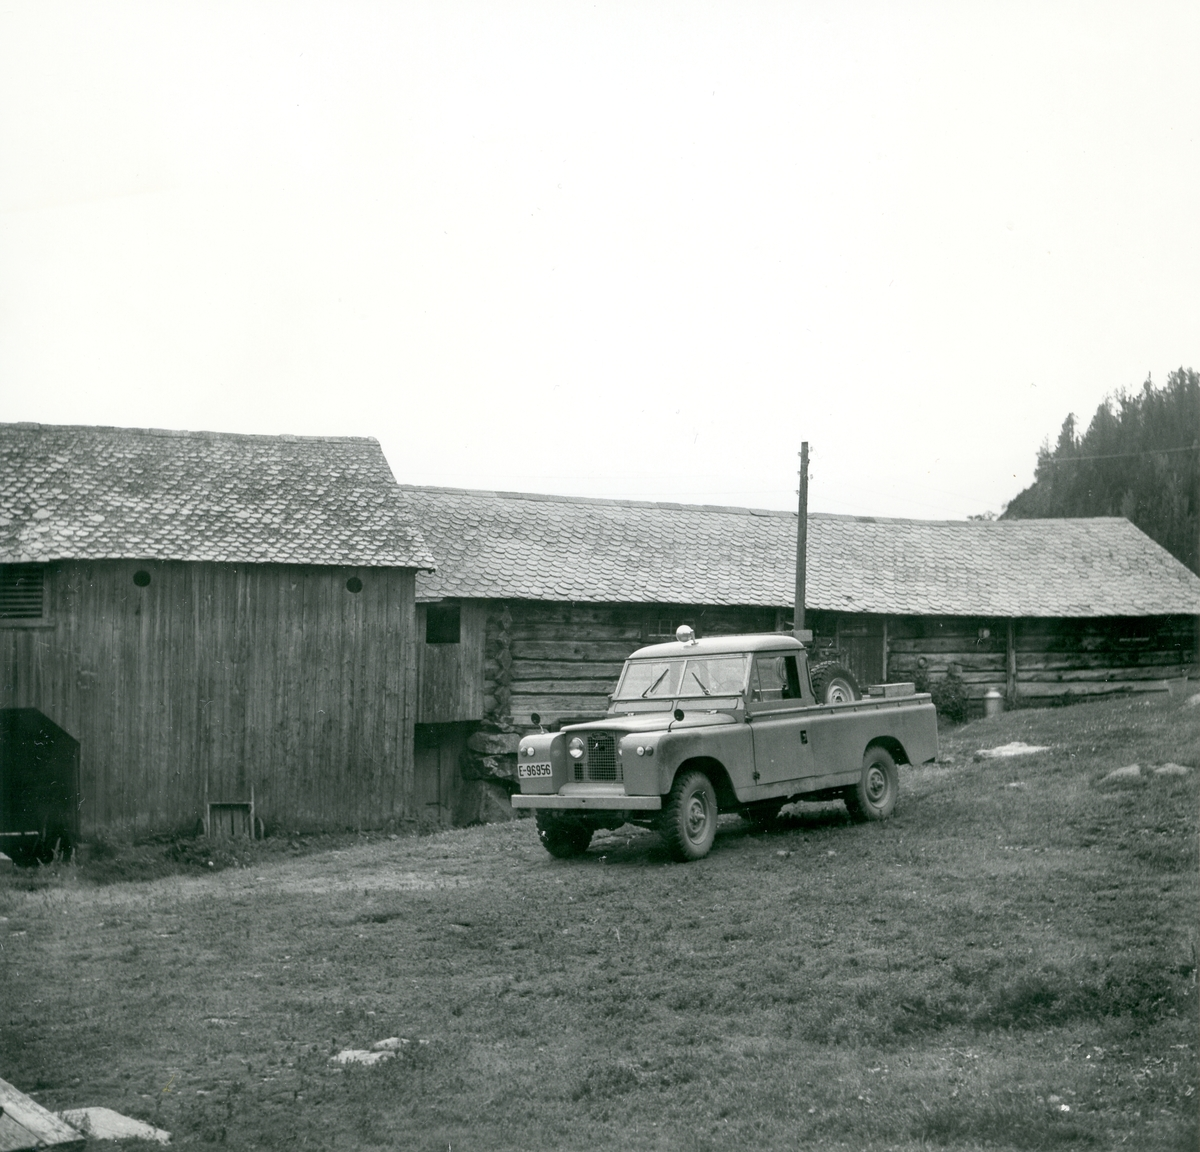 Land Rover utanfor bygningar på Granlund (Belsheim), 83/4, Vang i Valdres